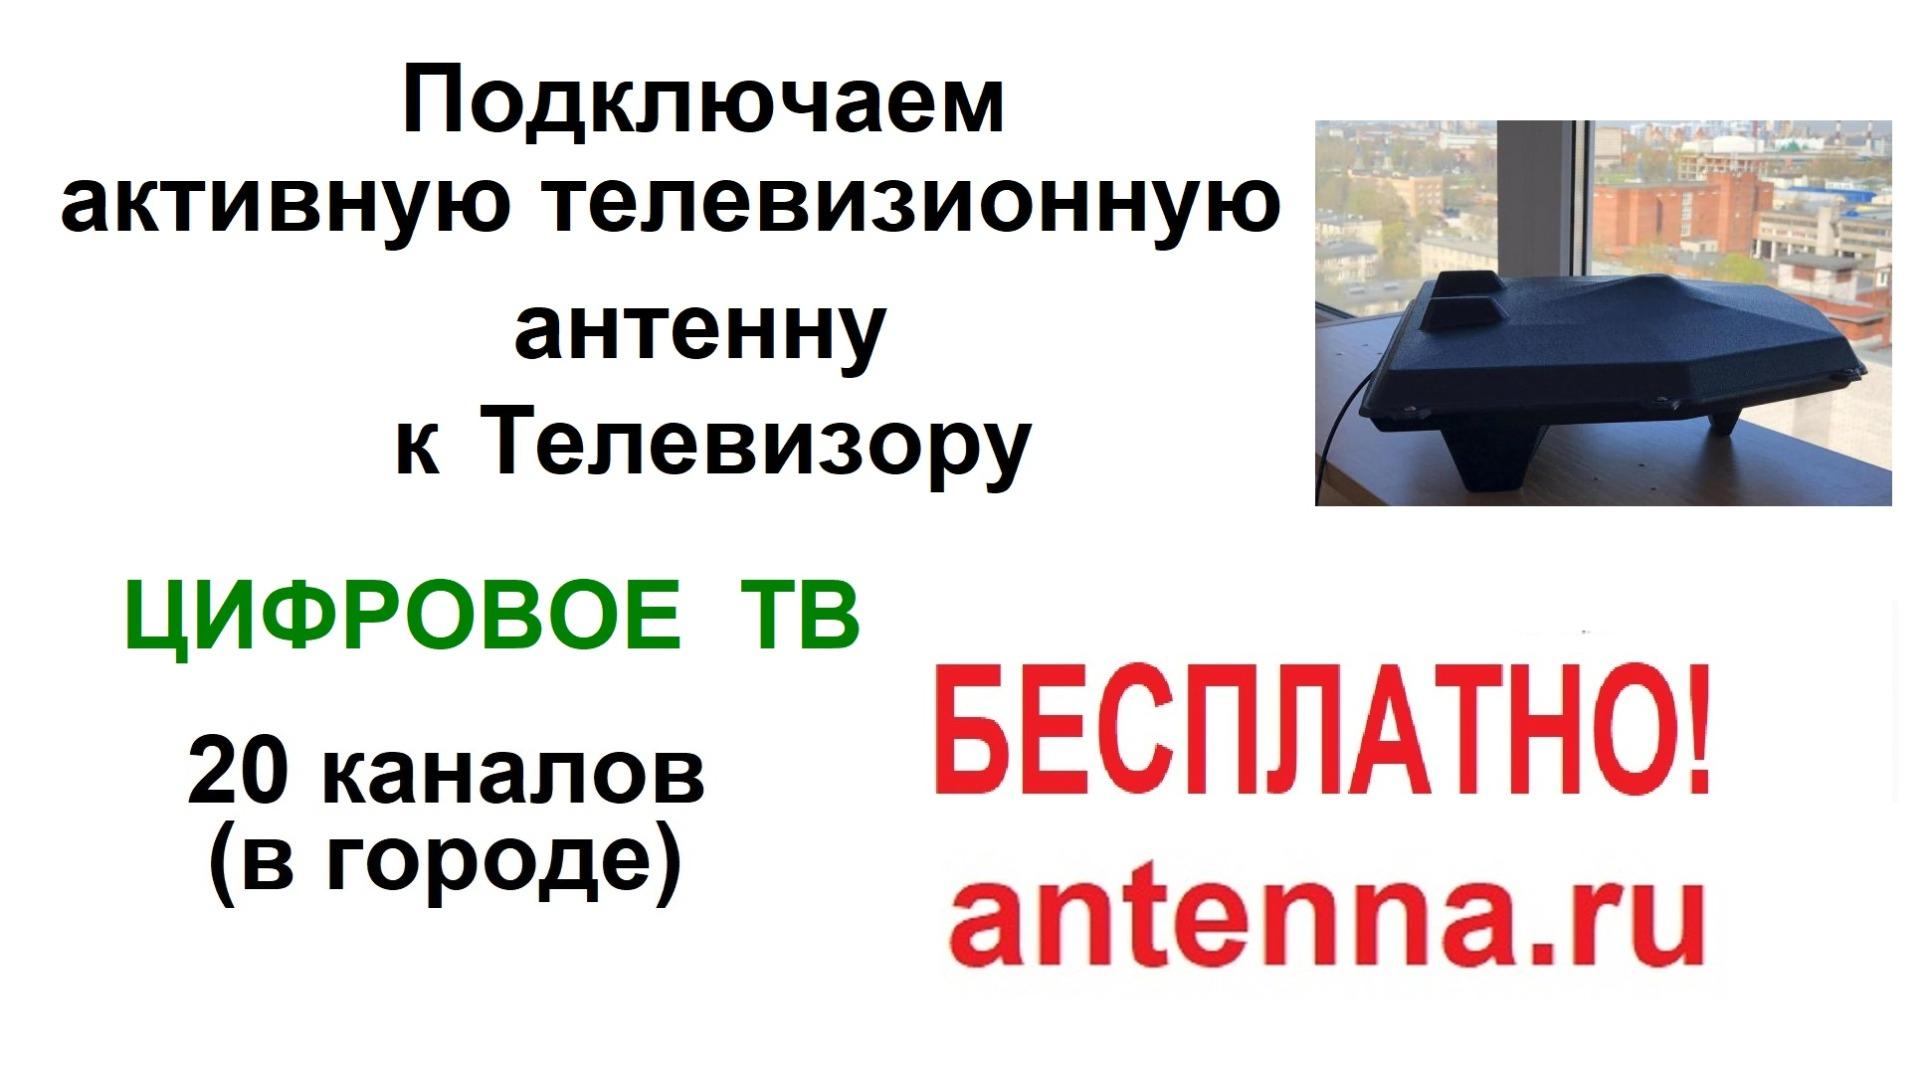 Цифровое ТВ. Ликбез. Как подать питание от телевизора на антенну активную цифровую ТВ DVB-T2